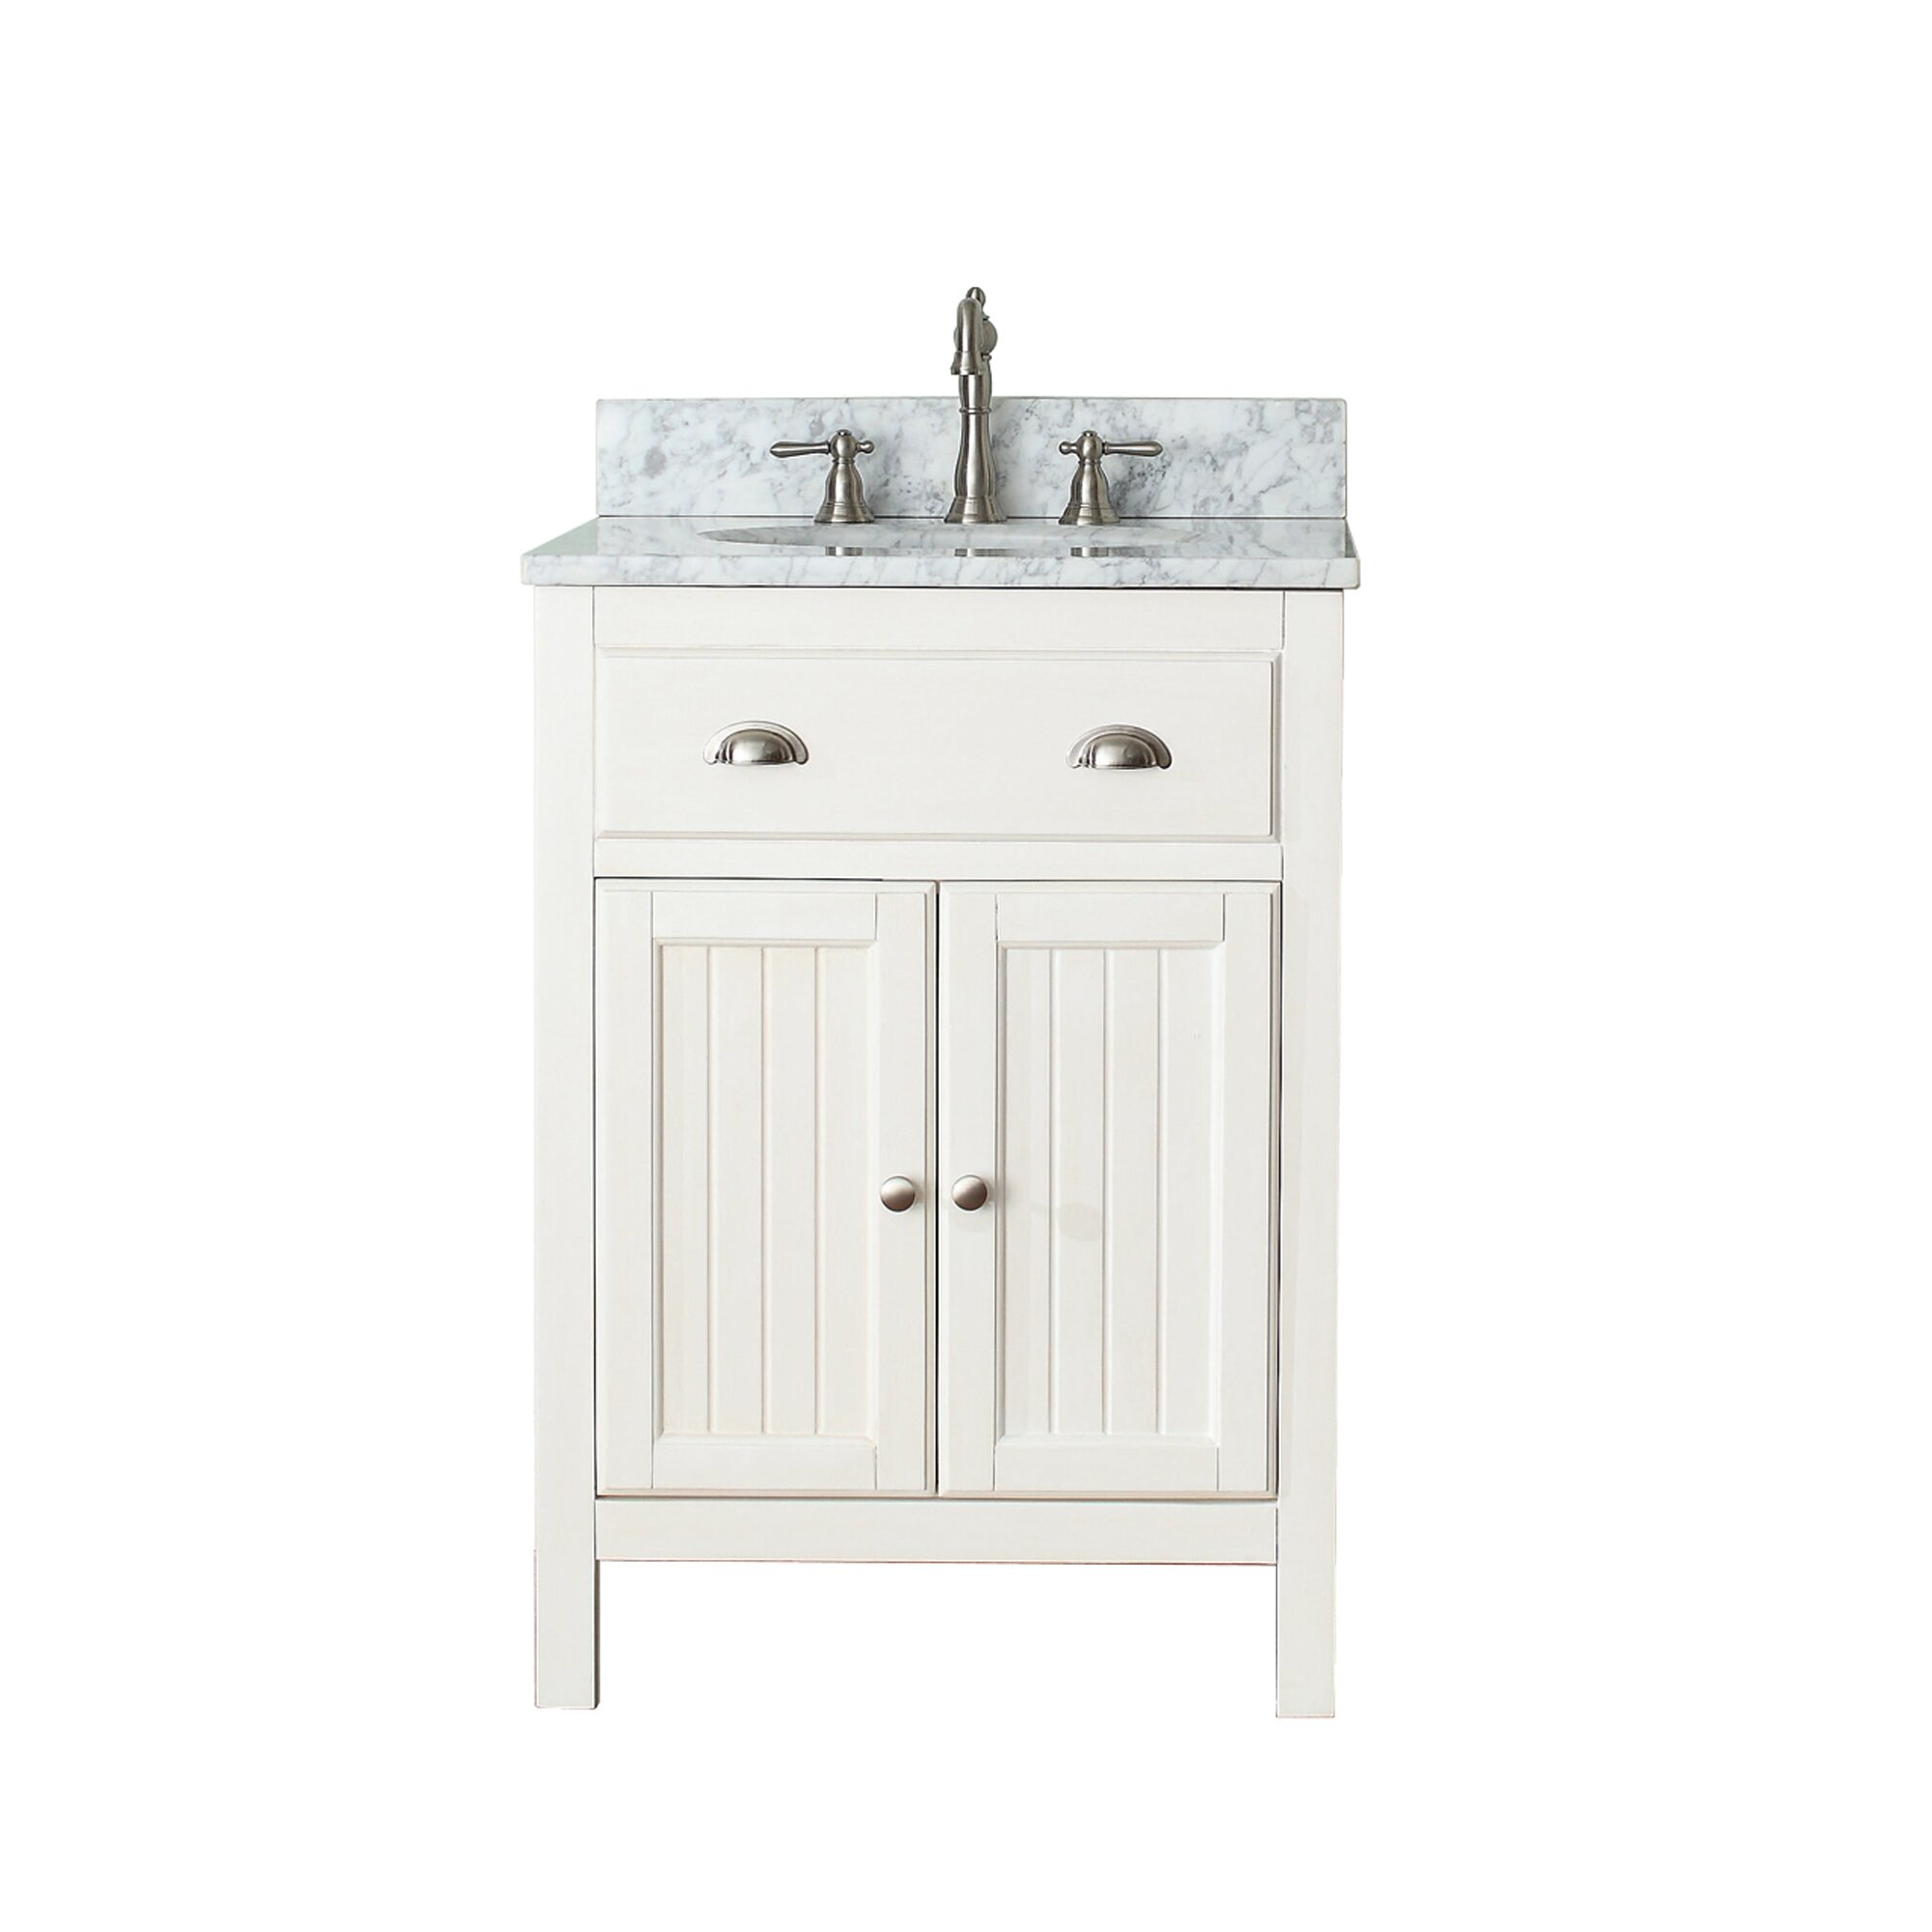 "Avanity Hamilton 25"" Single Bathroom Vanity Set & Reviews"